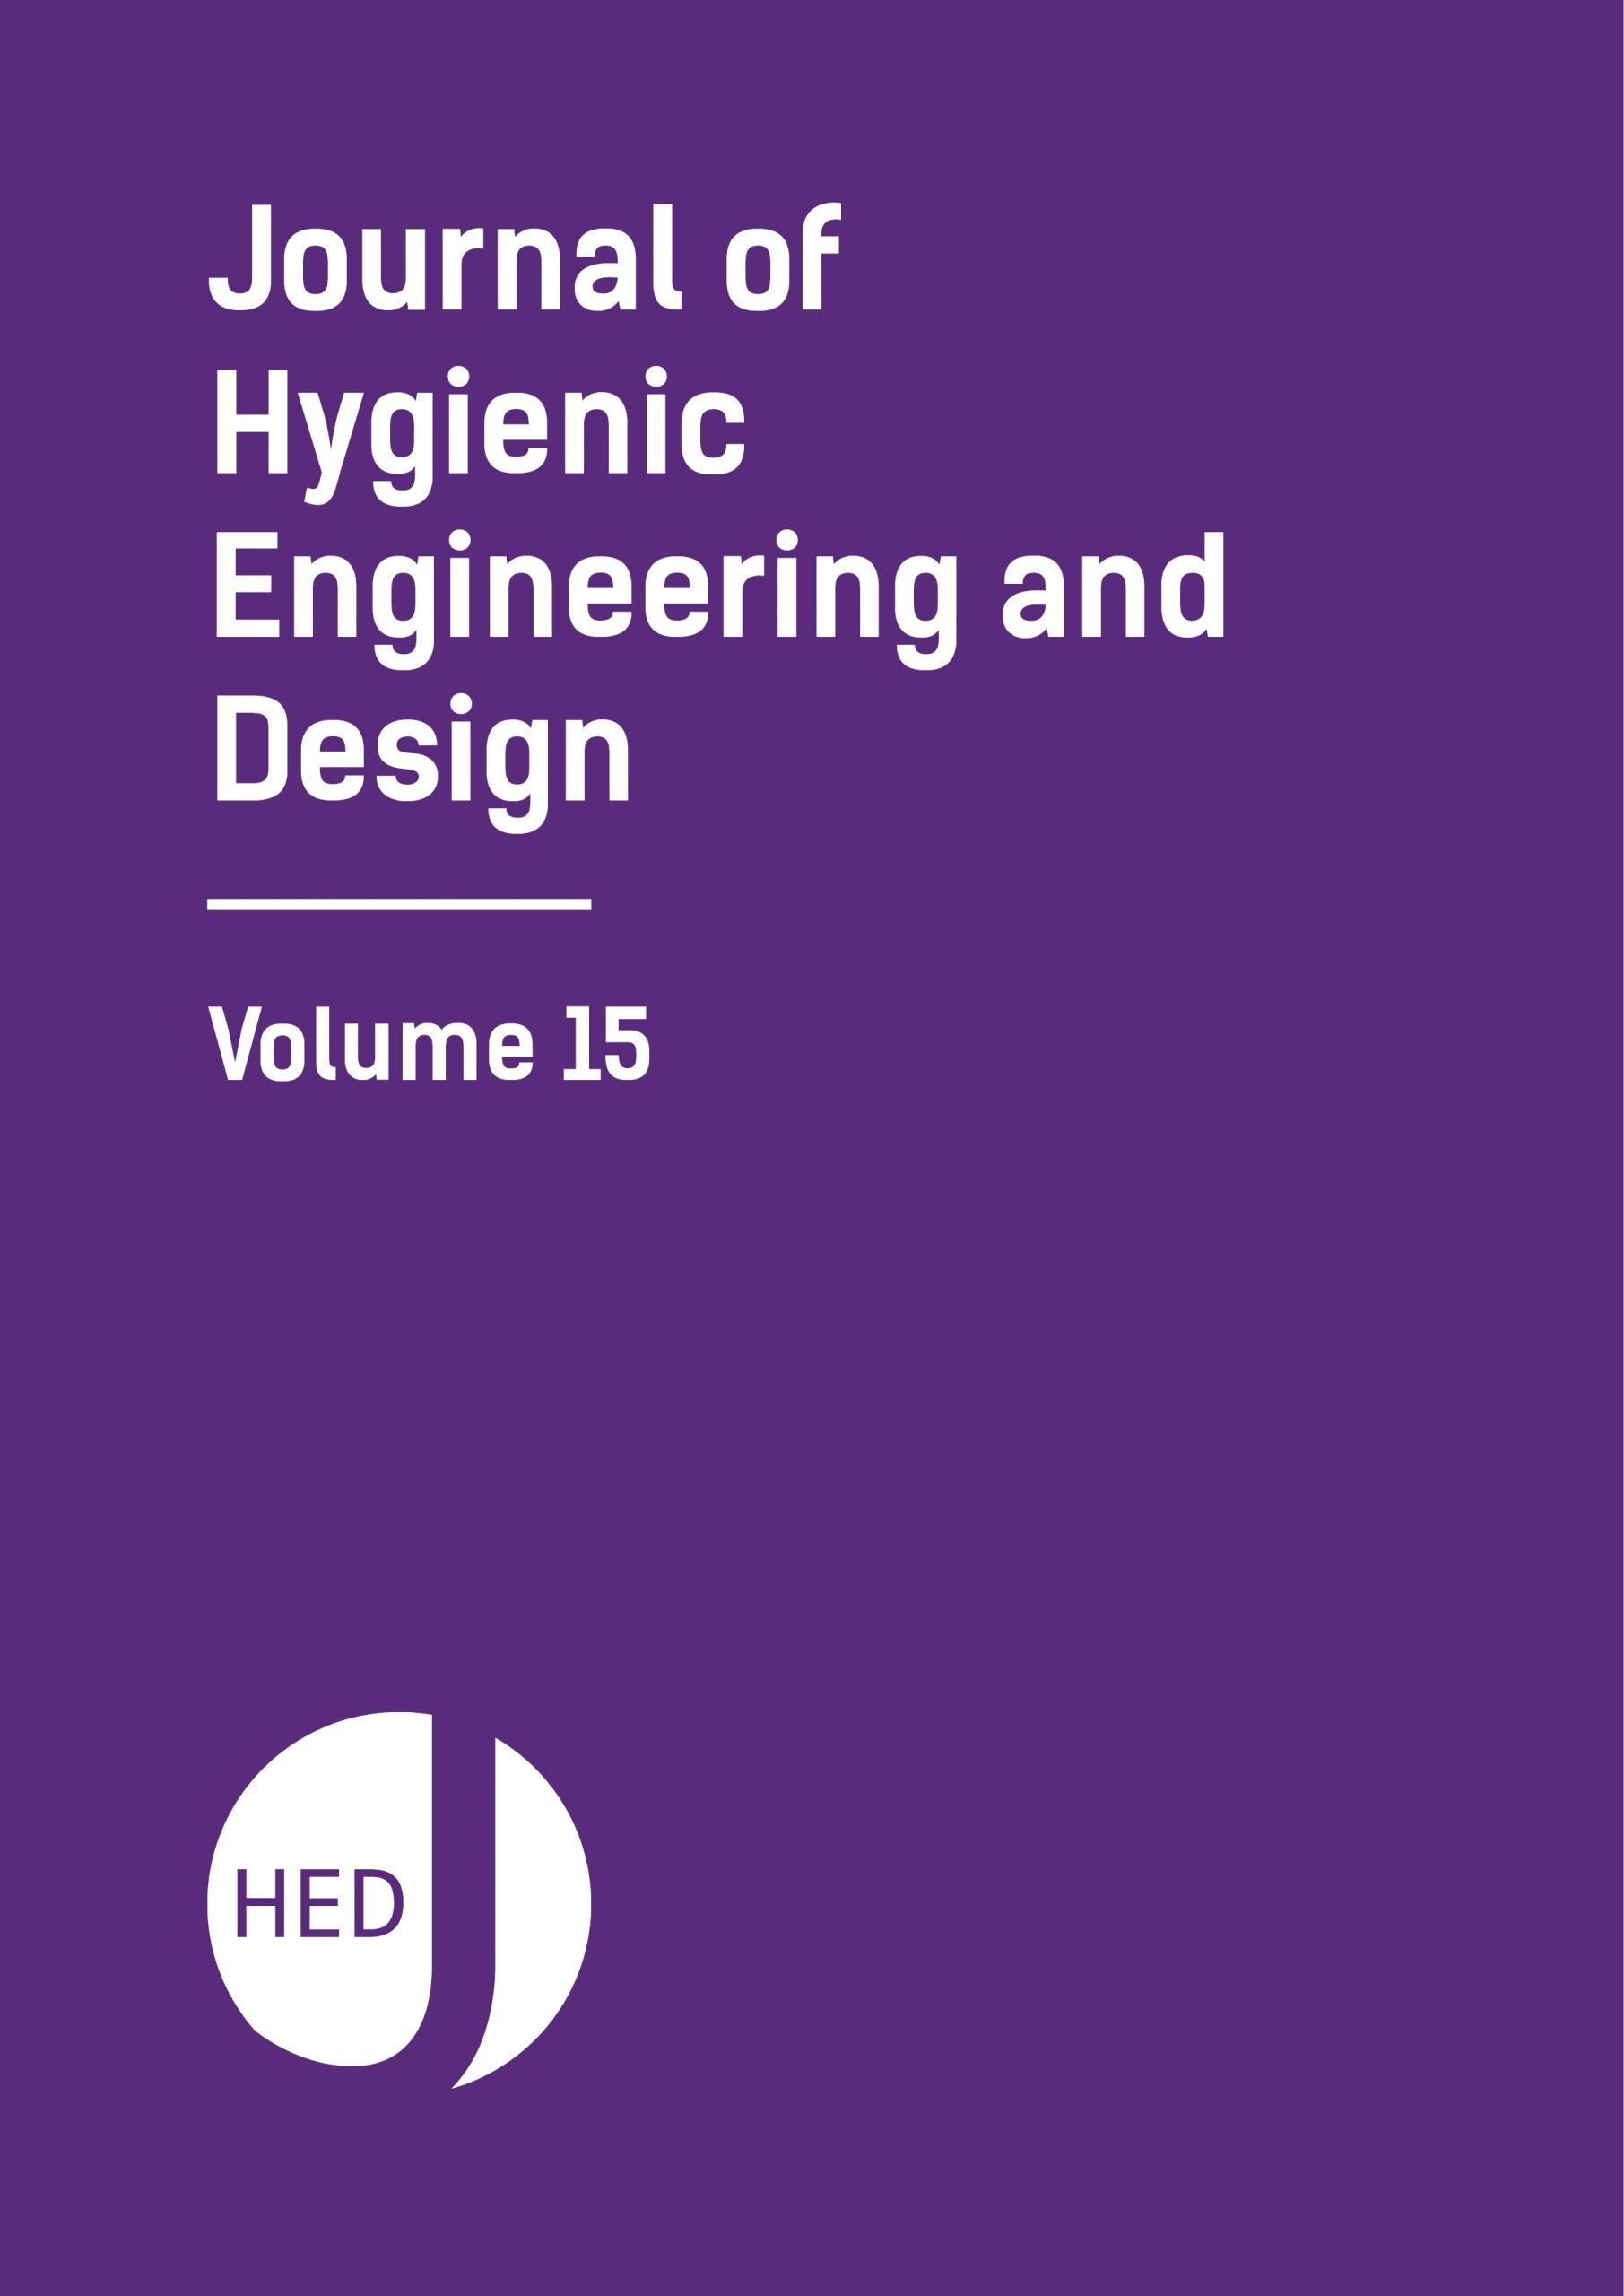 JHED Volume 15